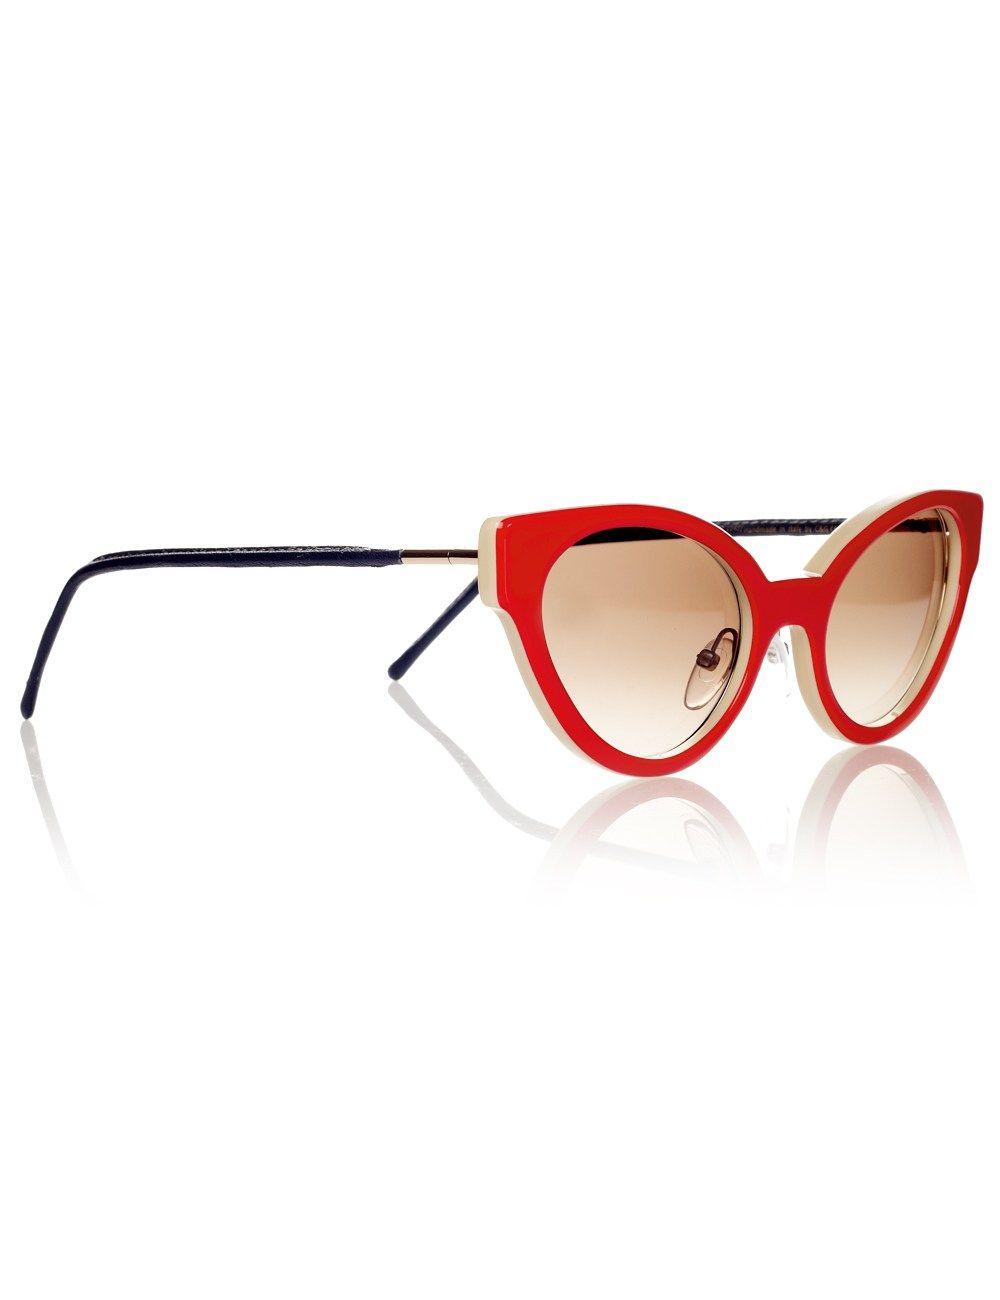 627e1fba4e Red Cat Eye Sunglasses Cutler and Gross